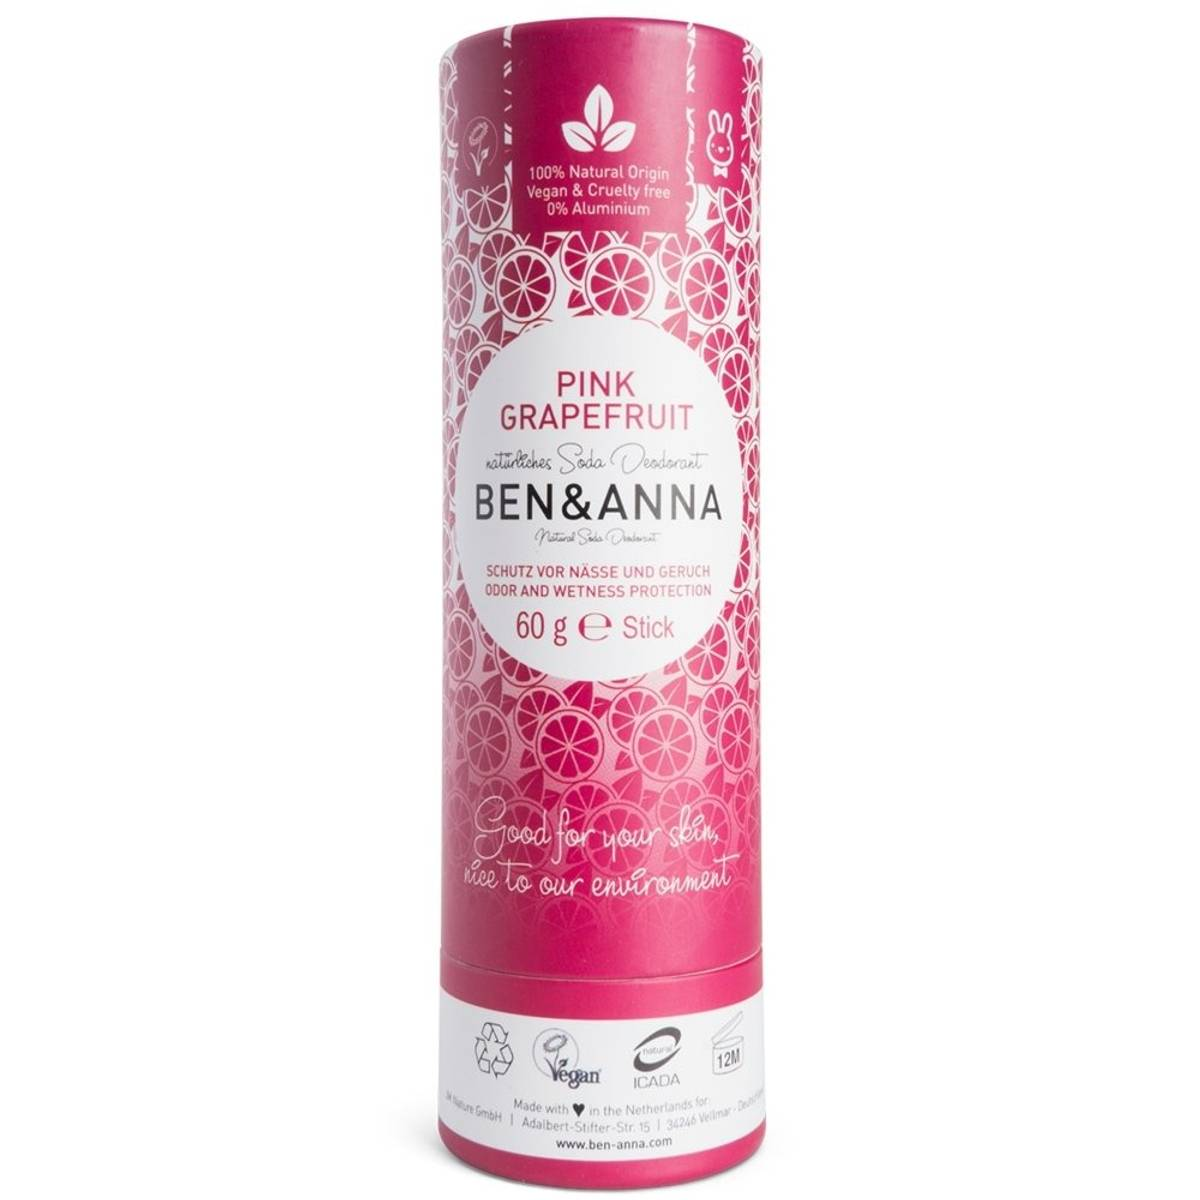 Deodorantstift 60g / Pink Grapefruit / Ben & Anna